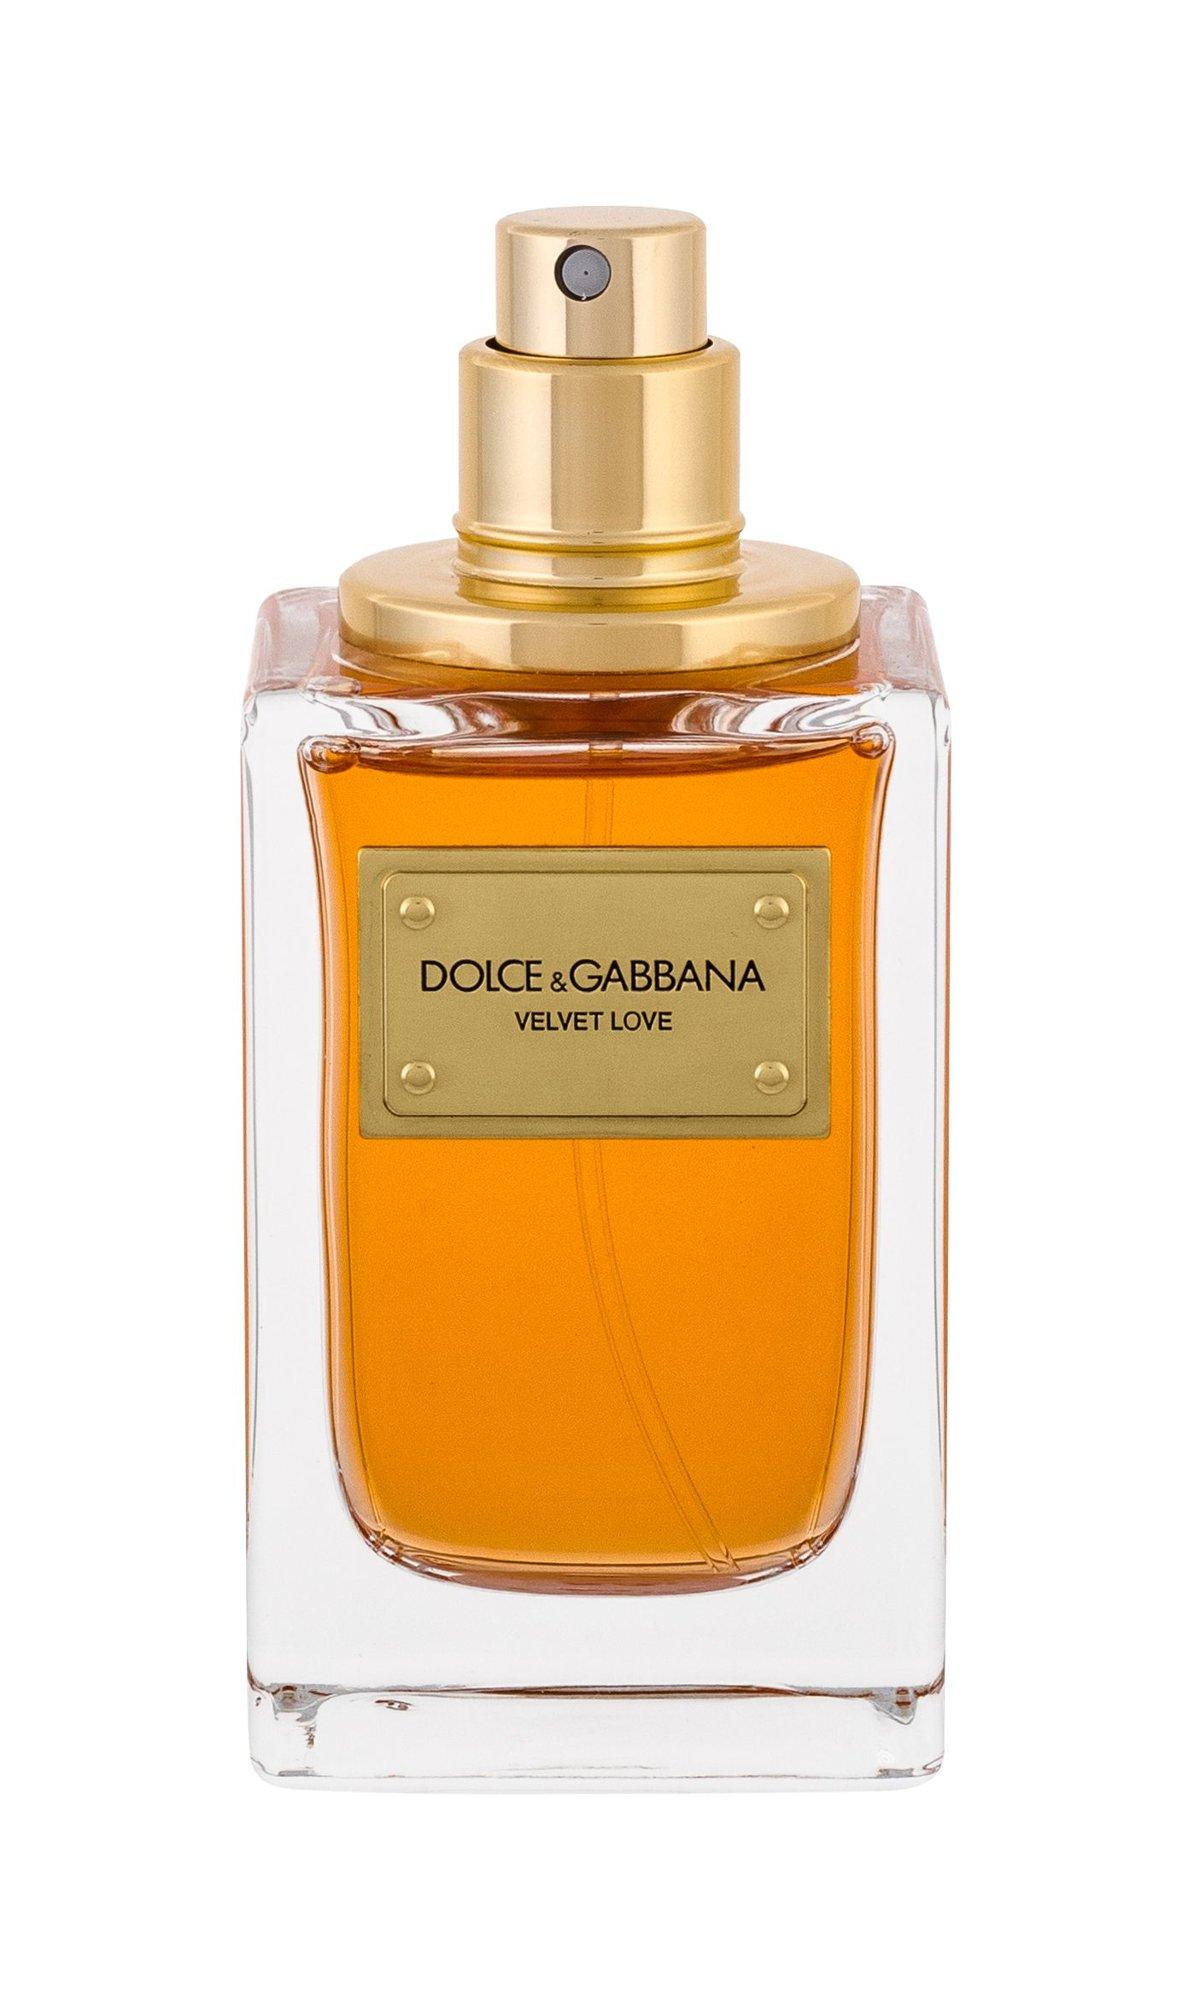 Dolce&Gabbana Velvet Love Eau de Parfum 50ml